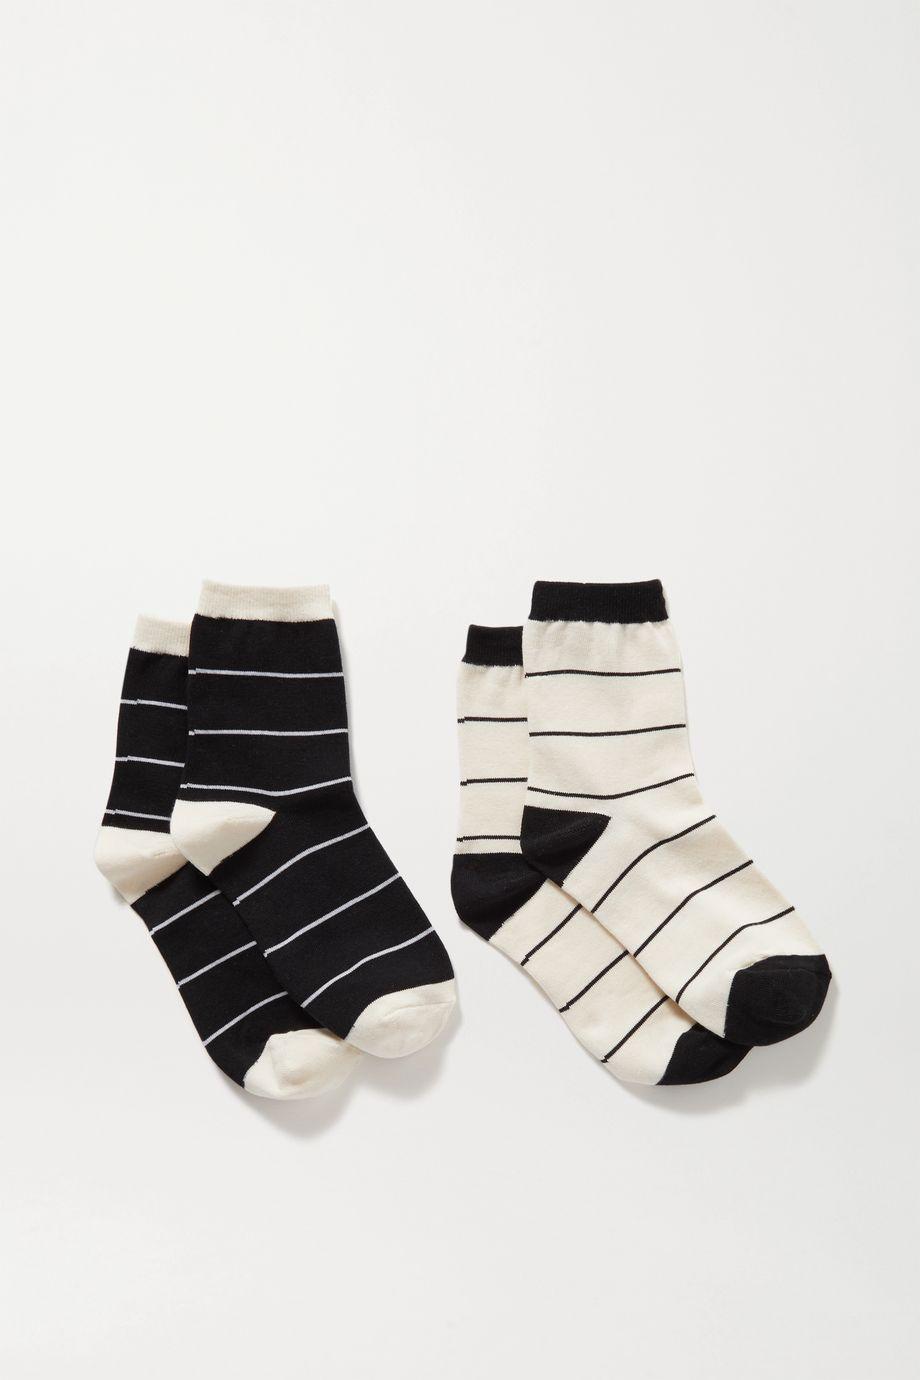 LESET Kelly set of two striped stretch-knit socks